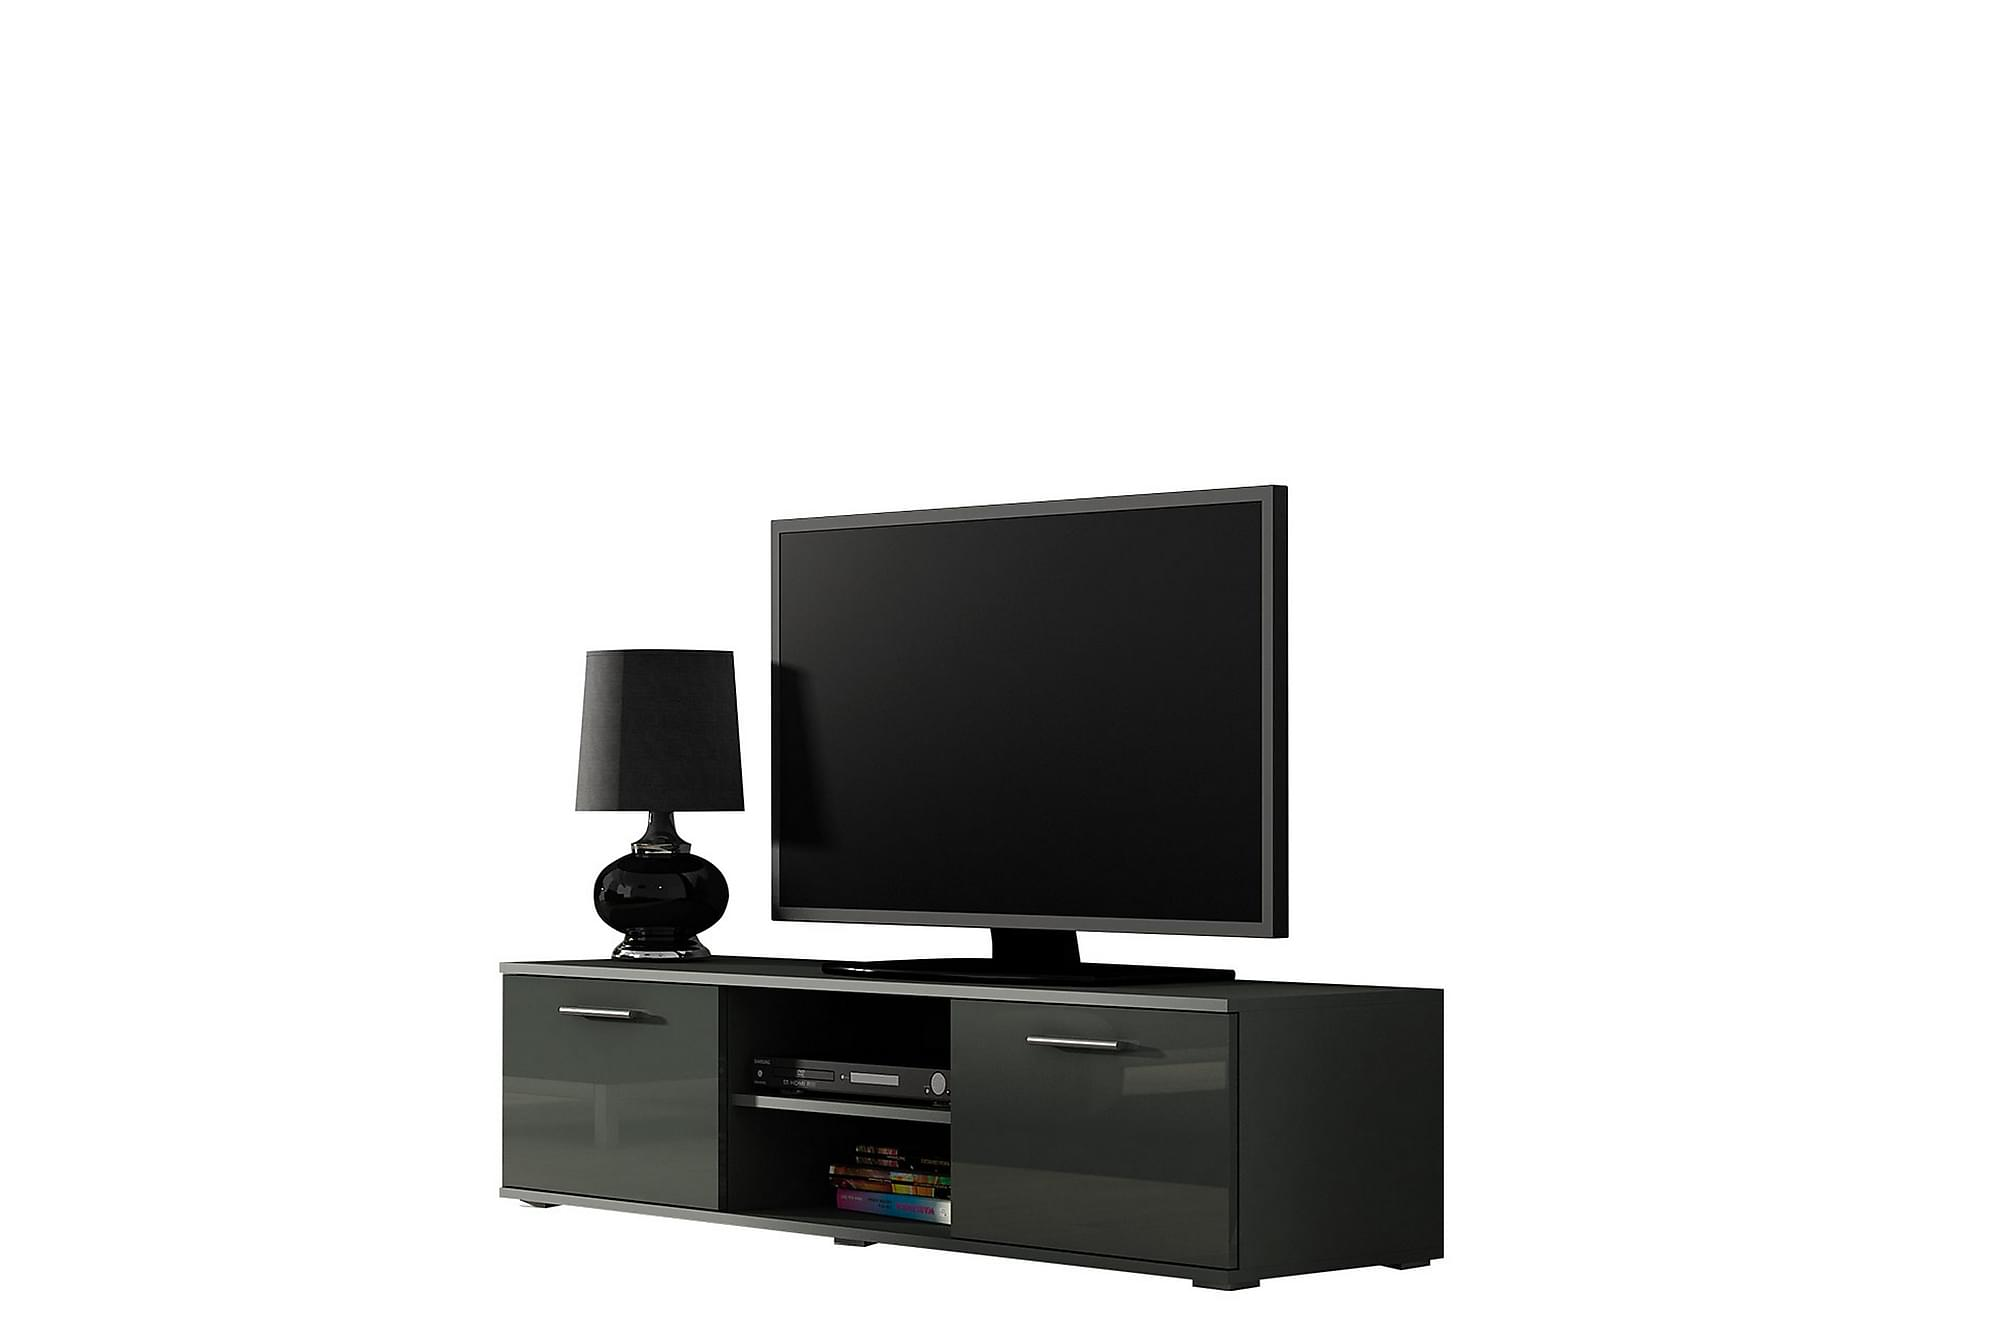 Soho TV-bänk 140x43x37 cm